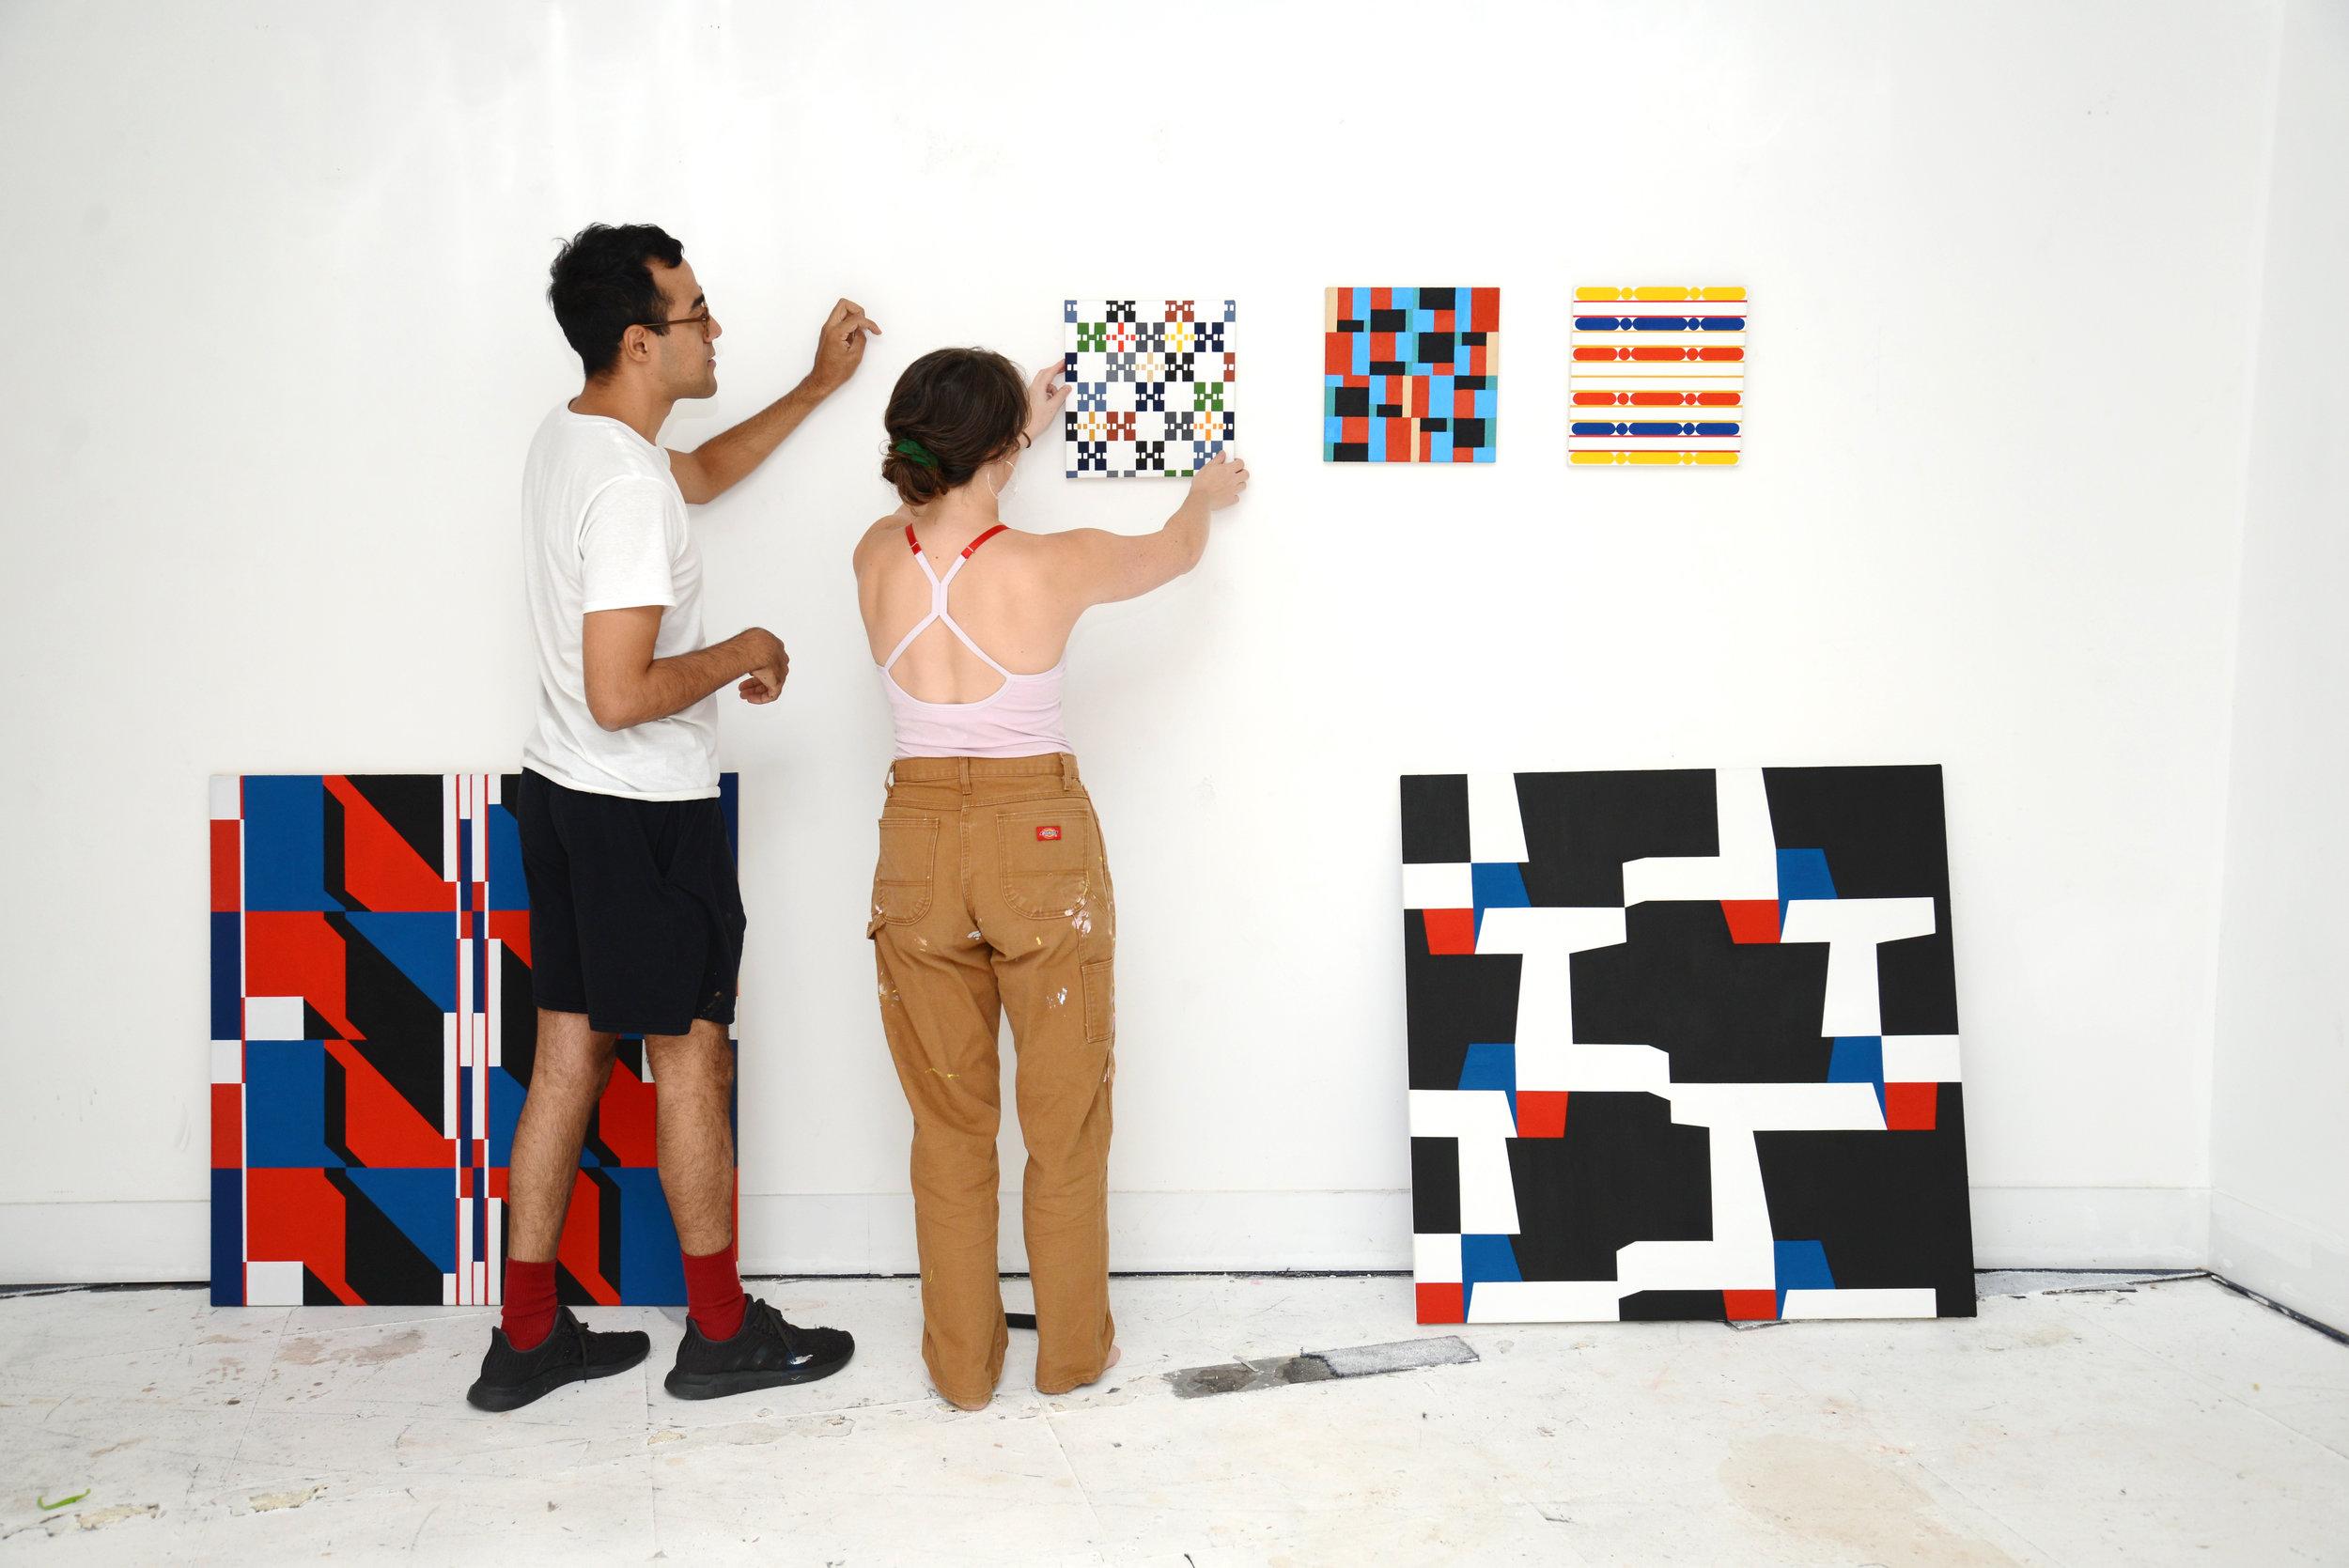 Kevin Umana and Danni O'Brien (Artwork: Kevin Umaña)